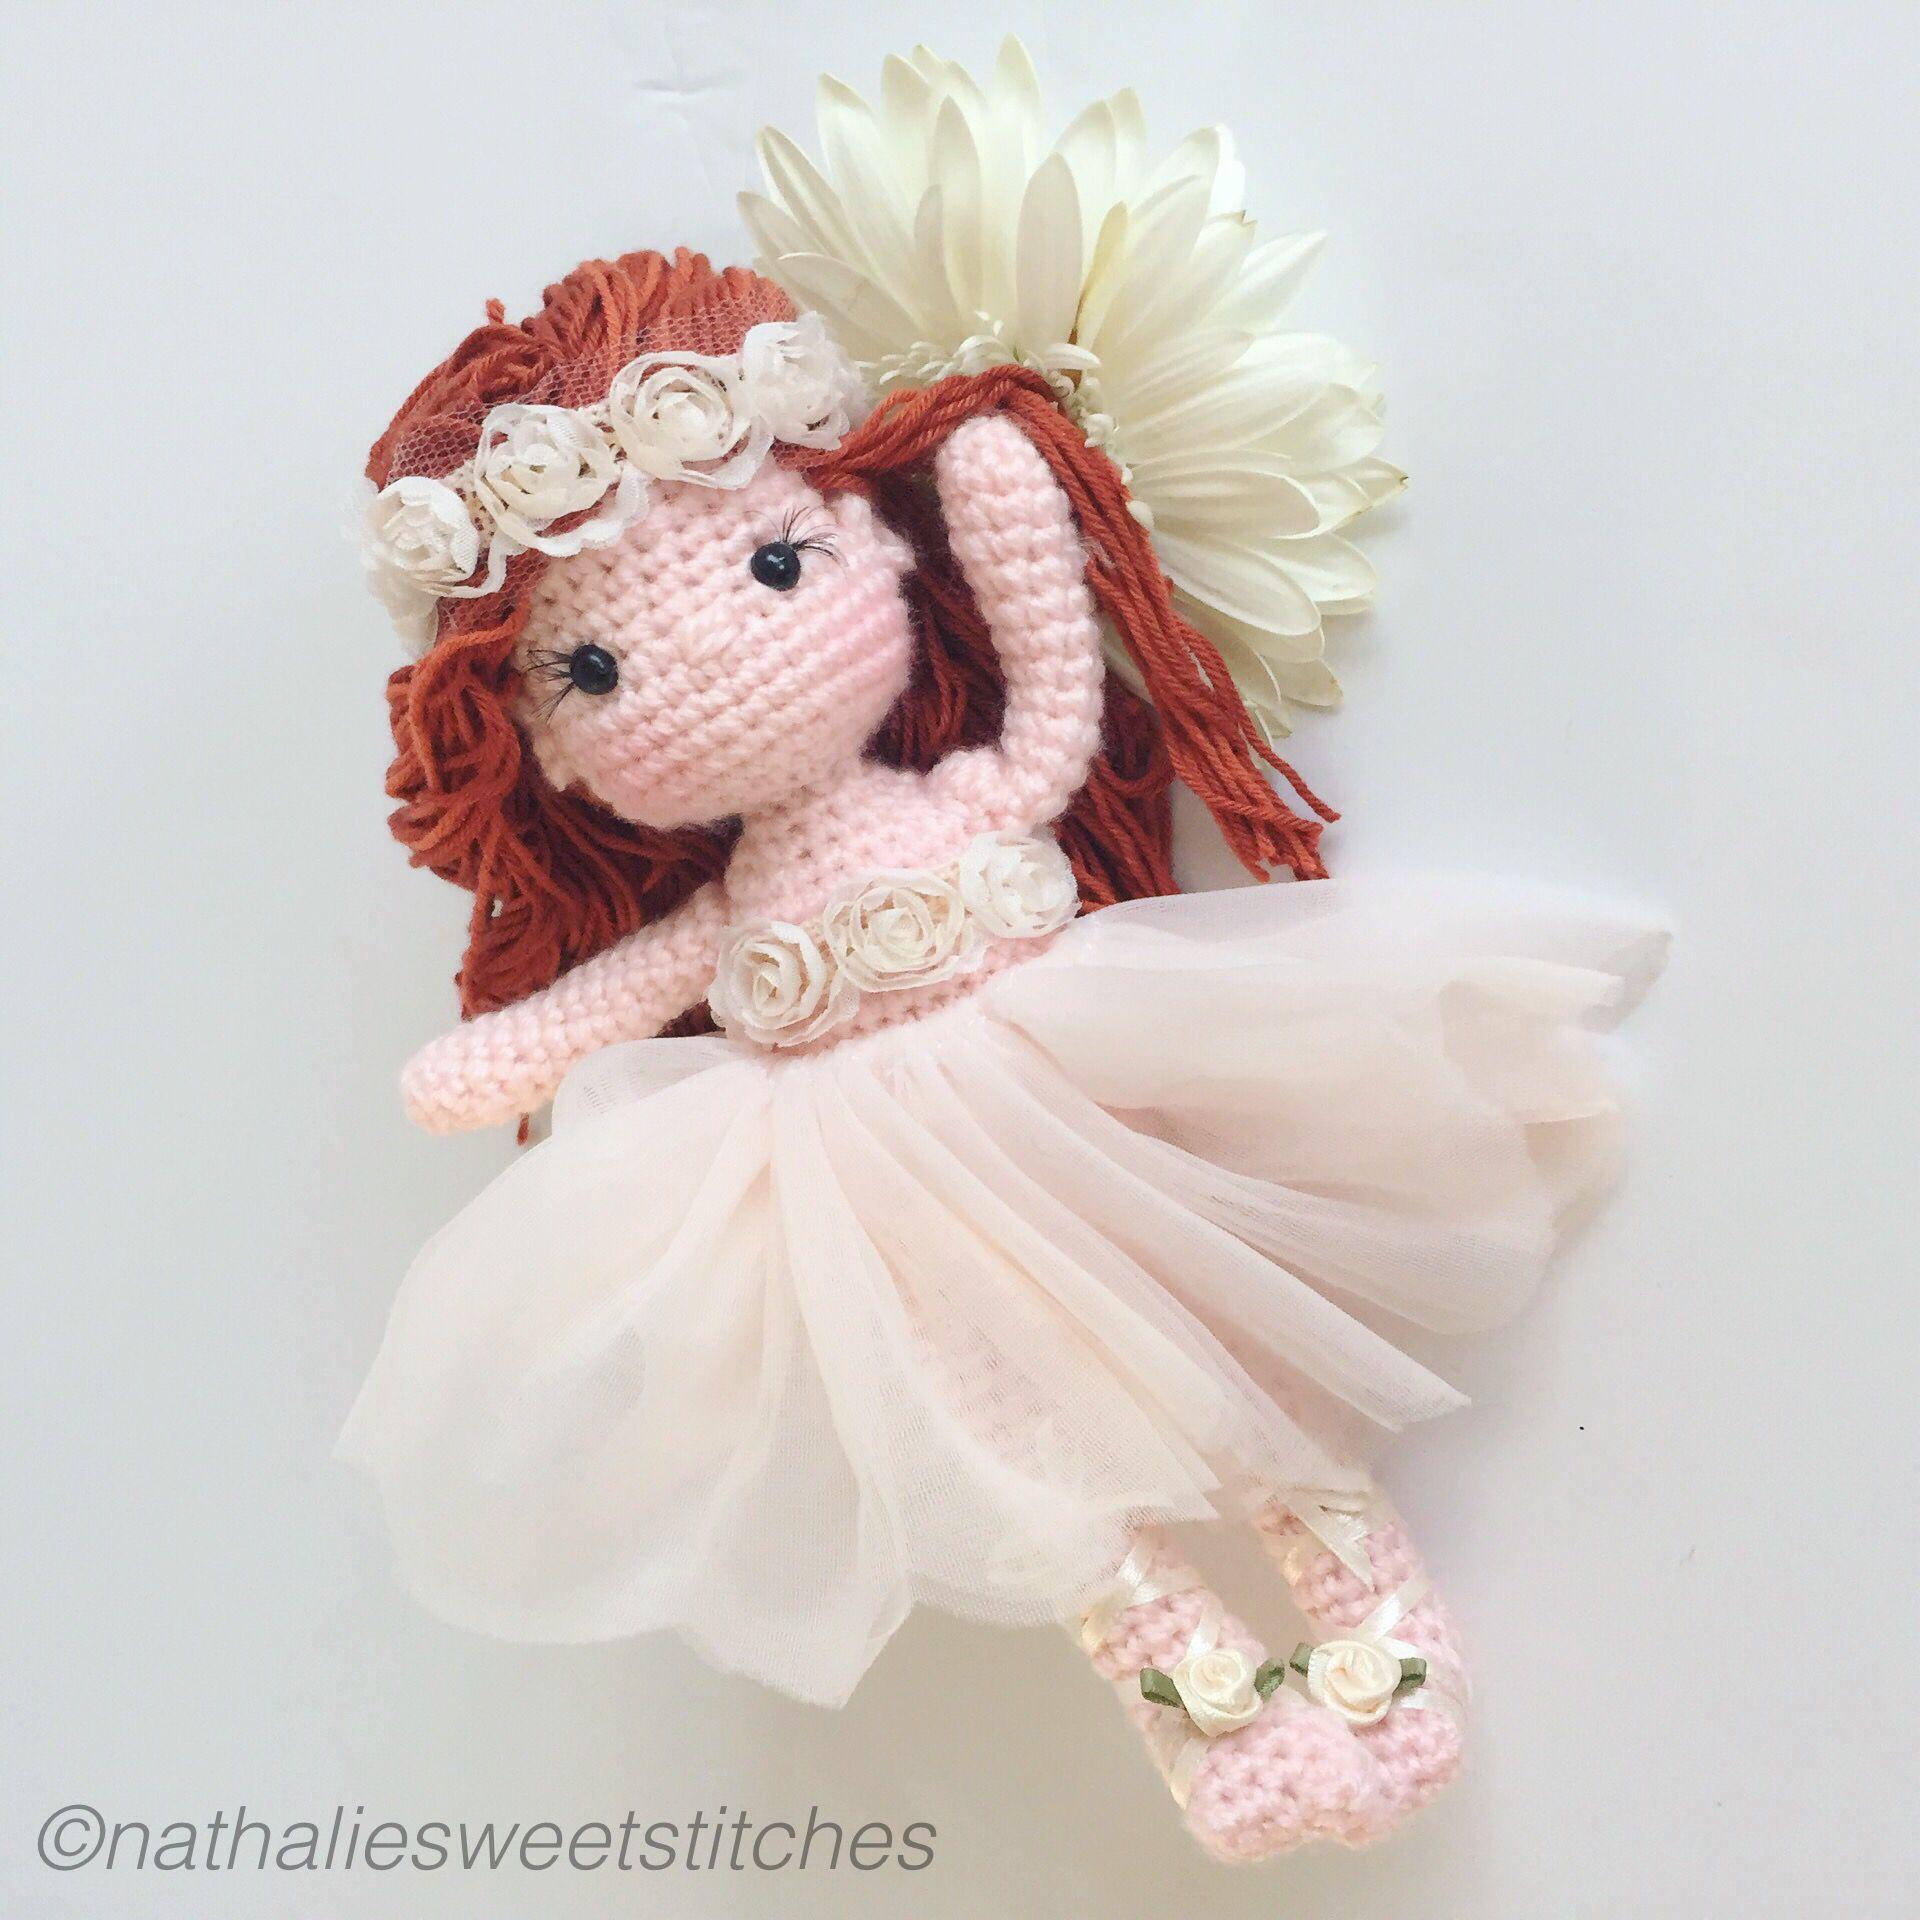 Flower Fairy Crochet Amigurumi Doll ☆